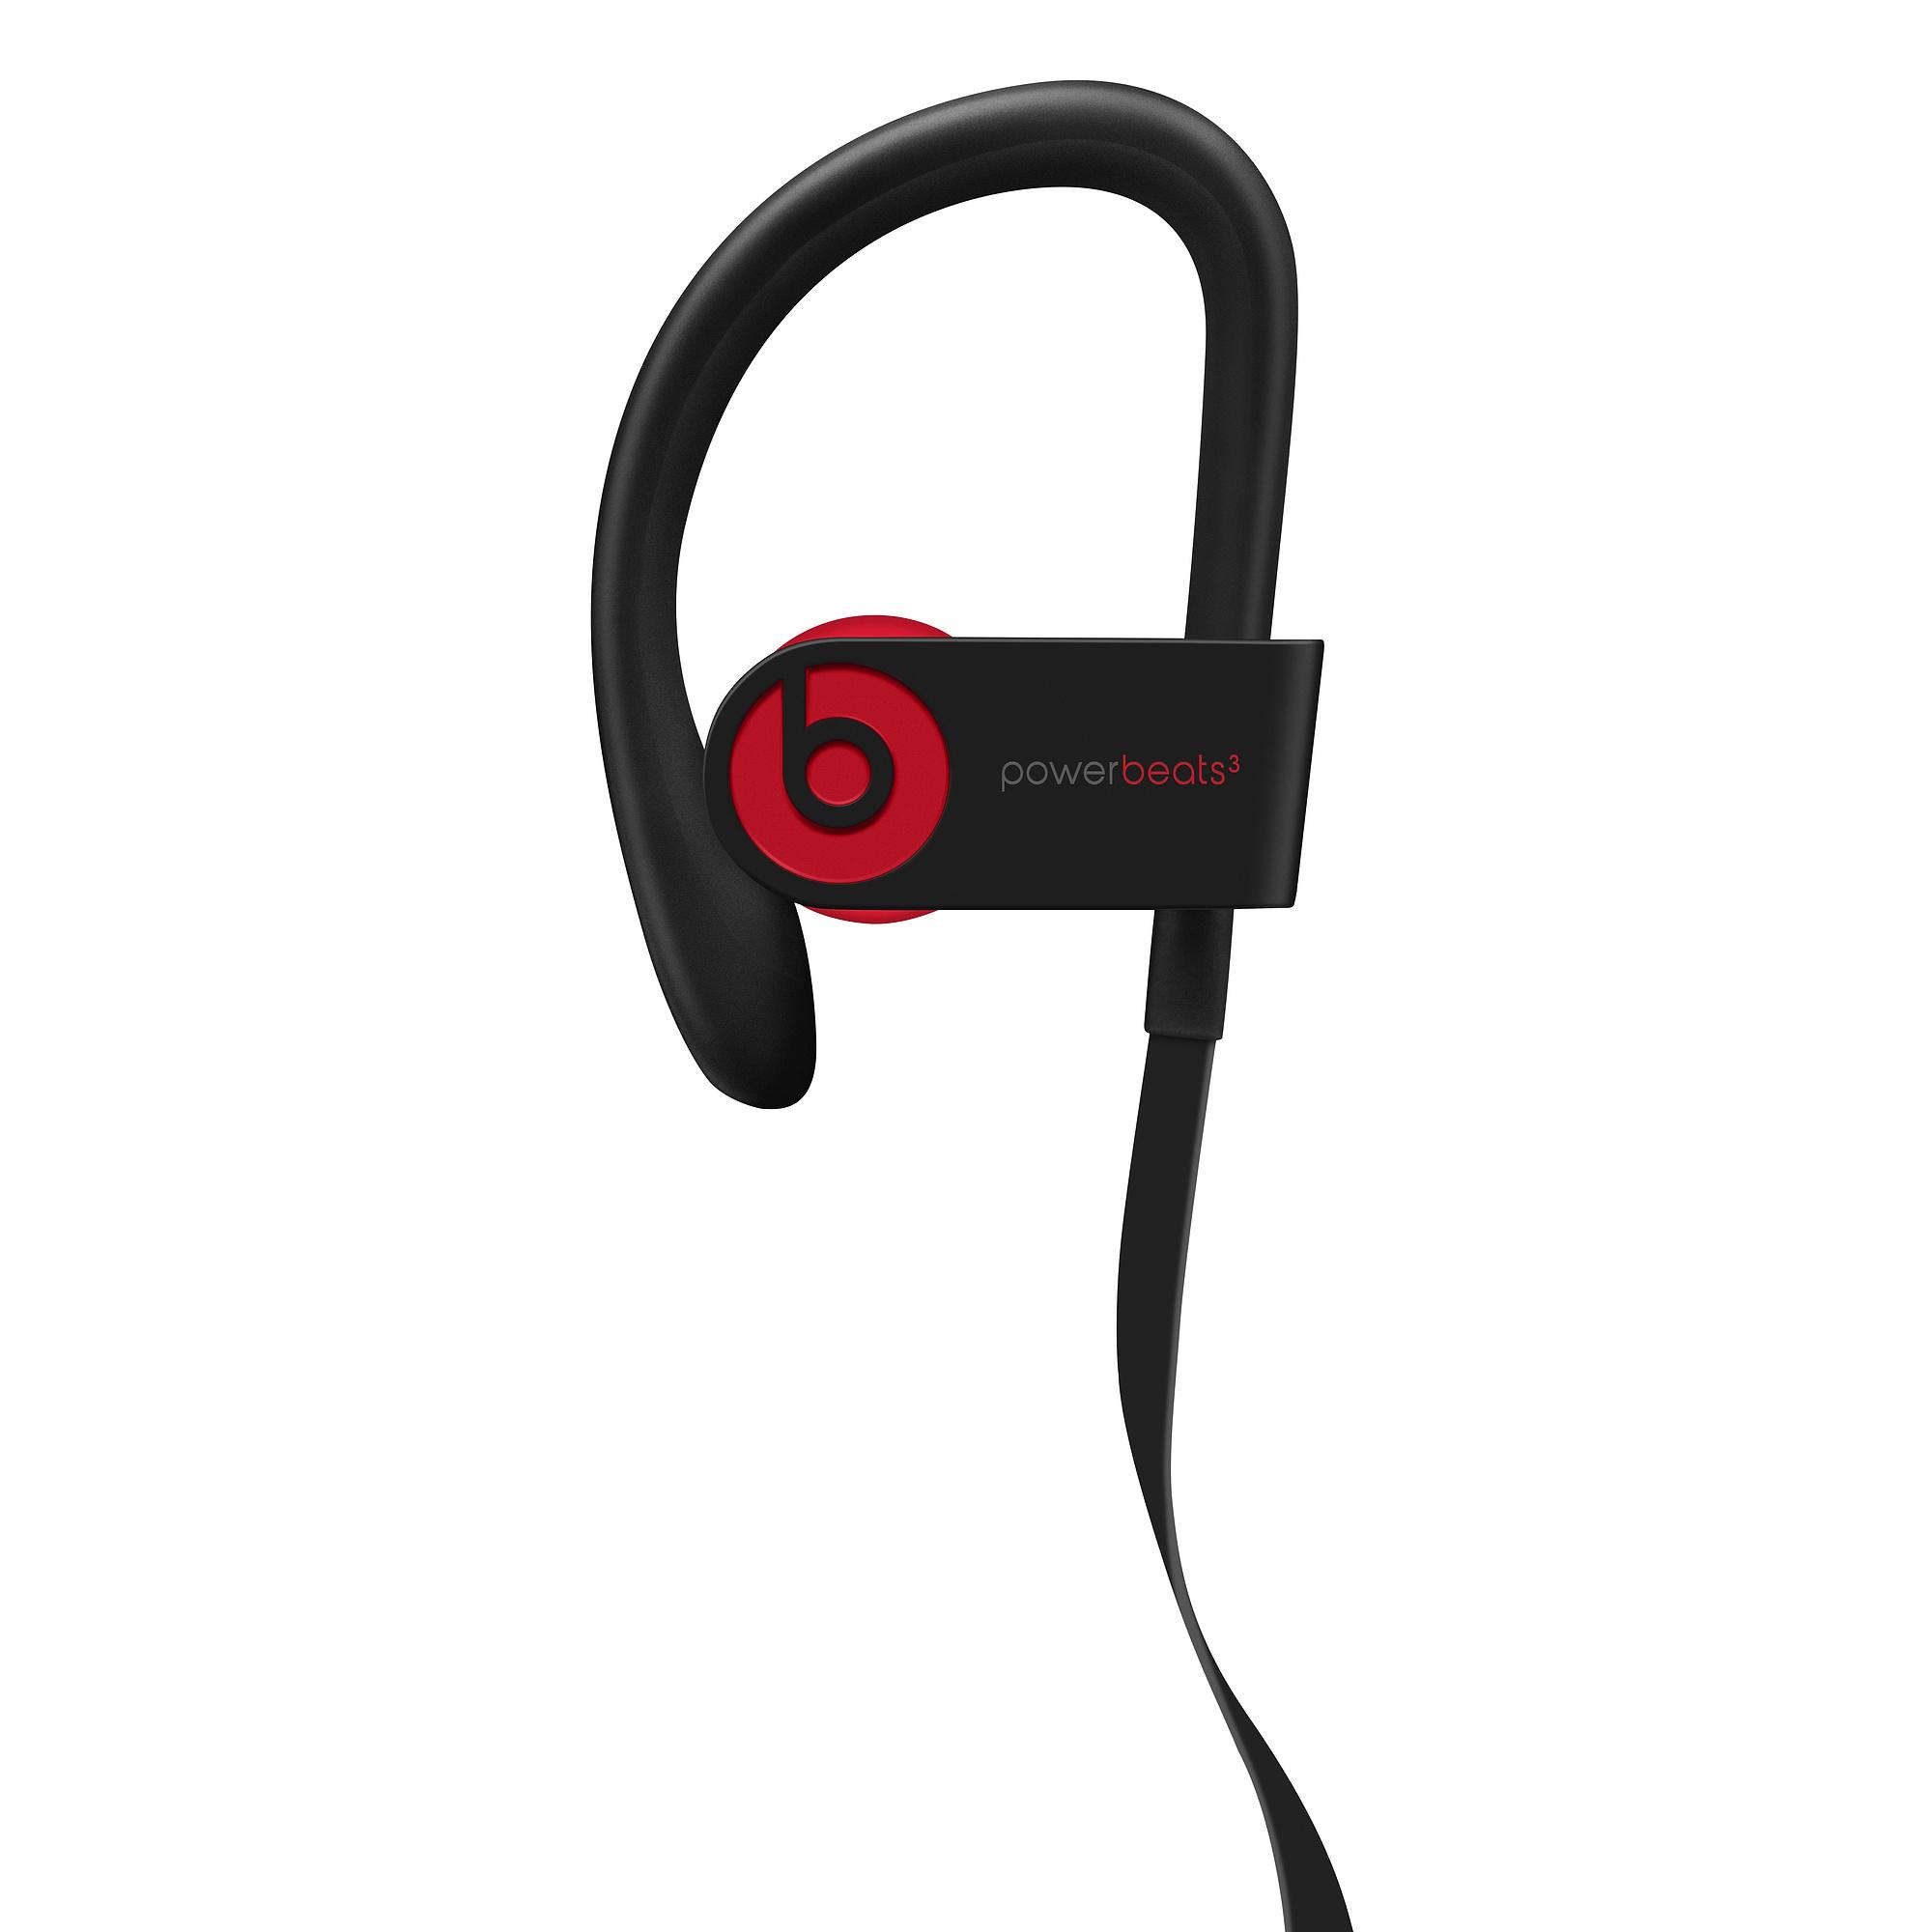 Beats-By-Dre-Powerbeats3-Wireless-In-Ear-Stereo-Bluetooth-Headphones thumbnail 7